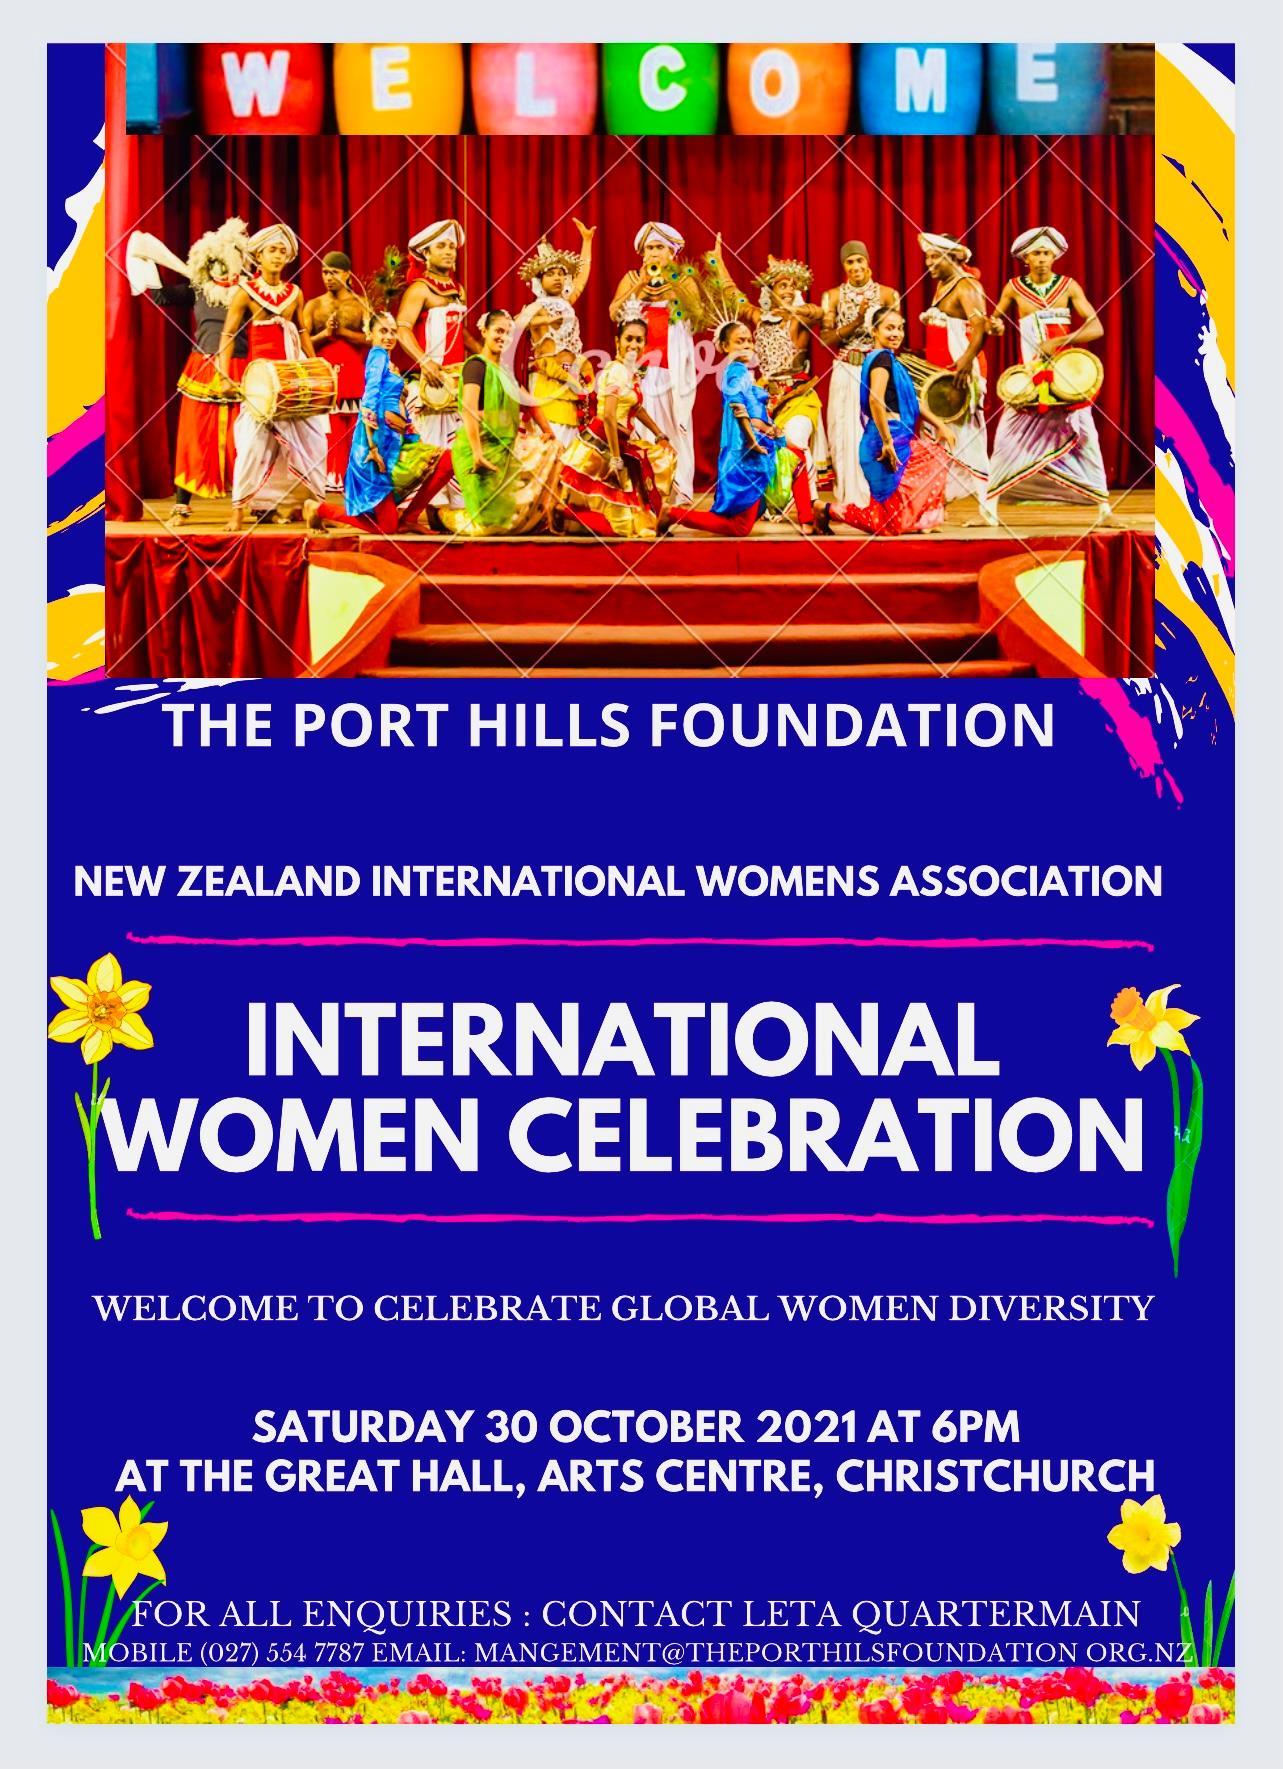 INTERNATIONAL WOMEN CELEBRATION